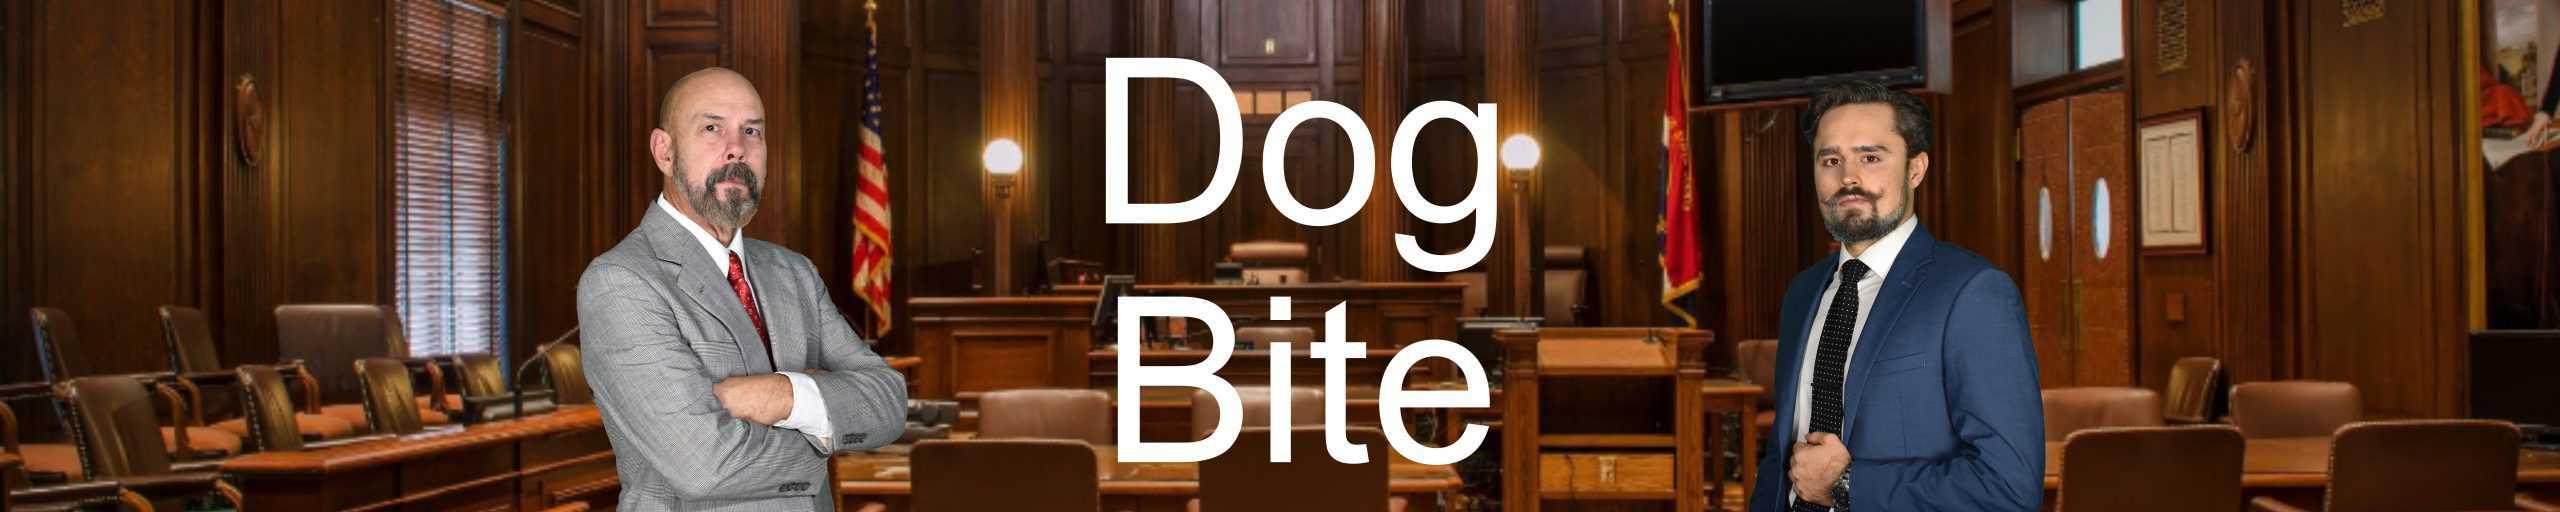 Dog-Bite-Accidents-Personal-Injury-Attorney-Lawyer-Hurt-Broken-Money-Settlement-Hospital-ER-Damage-Insurance-Company-Pit-Pitbull-Teeth-Torn-Bleeding-Scarring-Face